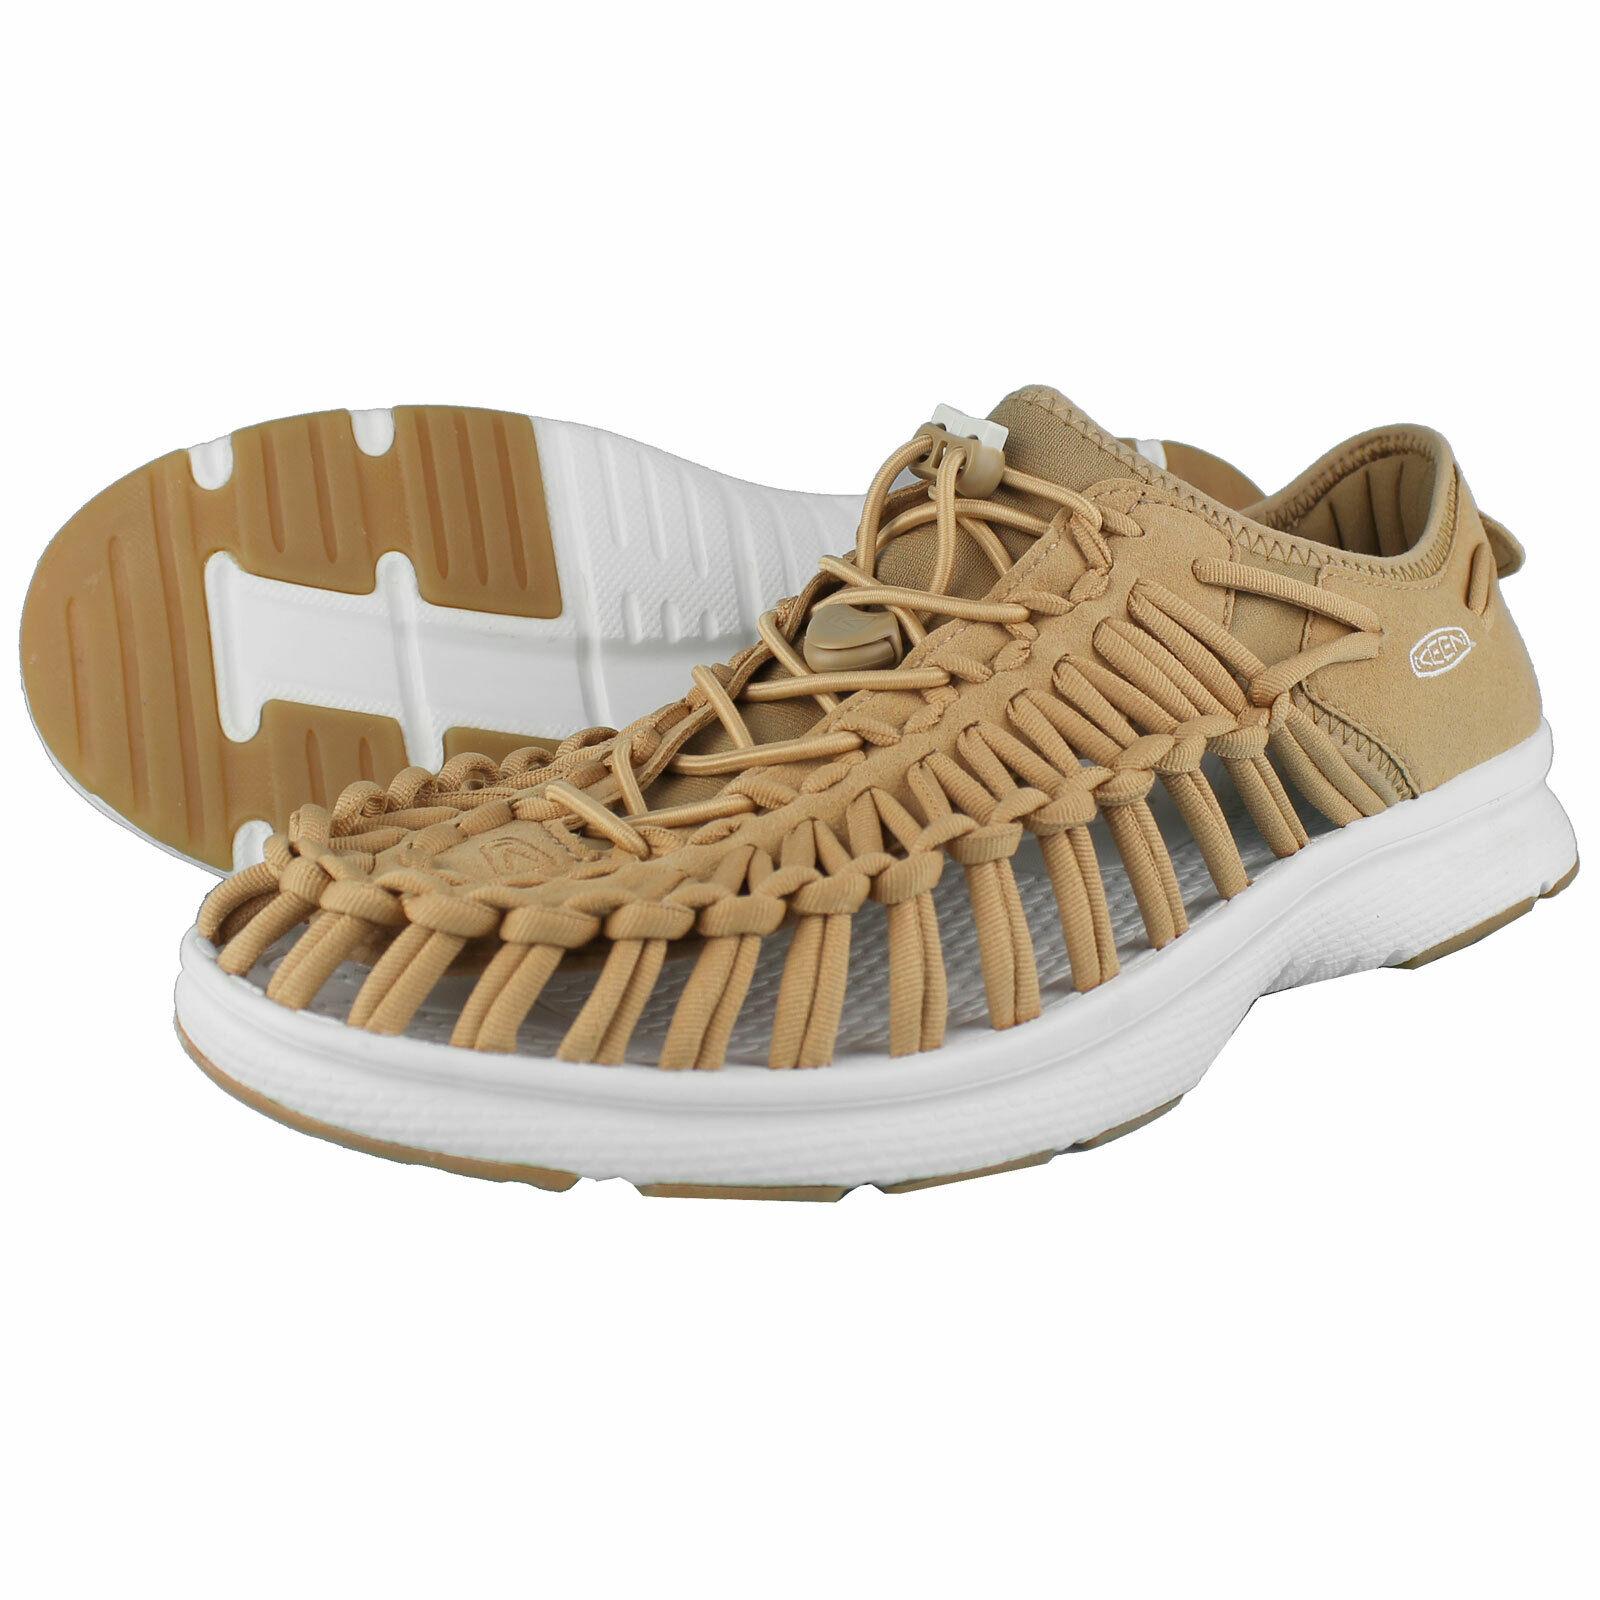 Keen Uneek Uneek Uneek O2 Sandali Uomo Sandaletti Scarpe Estive Scarpe Basse Nuovo | Moderno Ed Elegante Nella Moda  5253d3